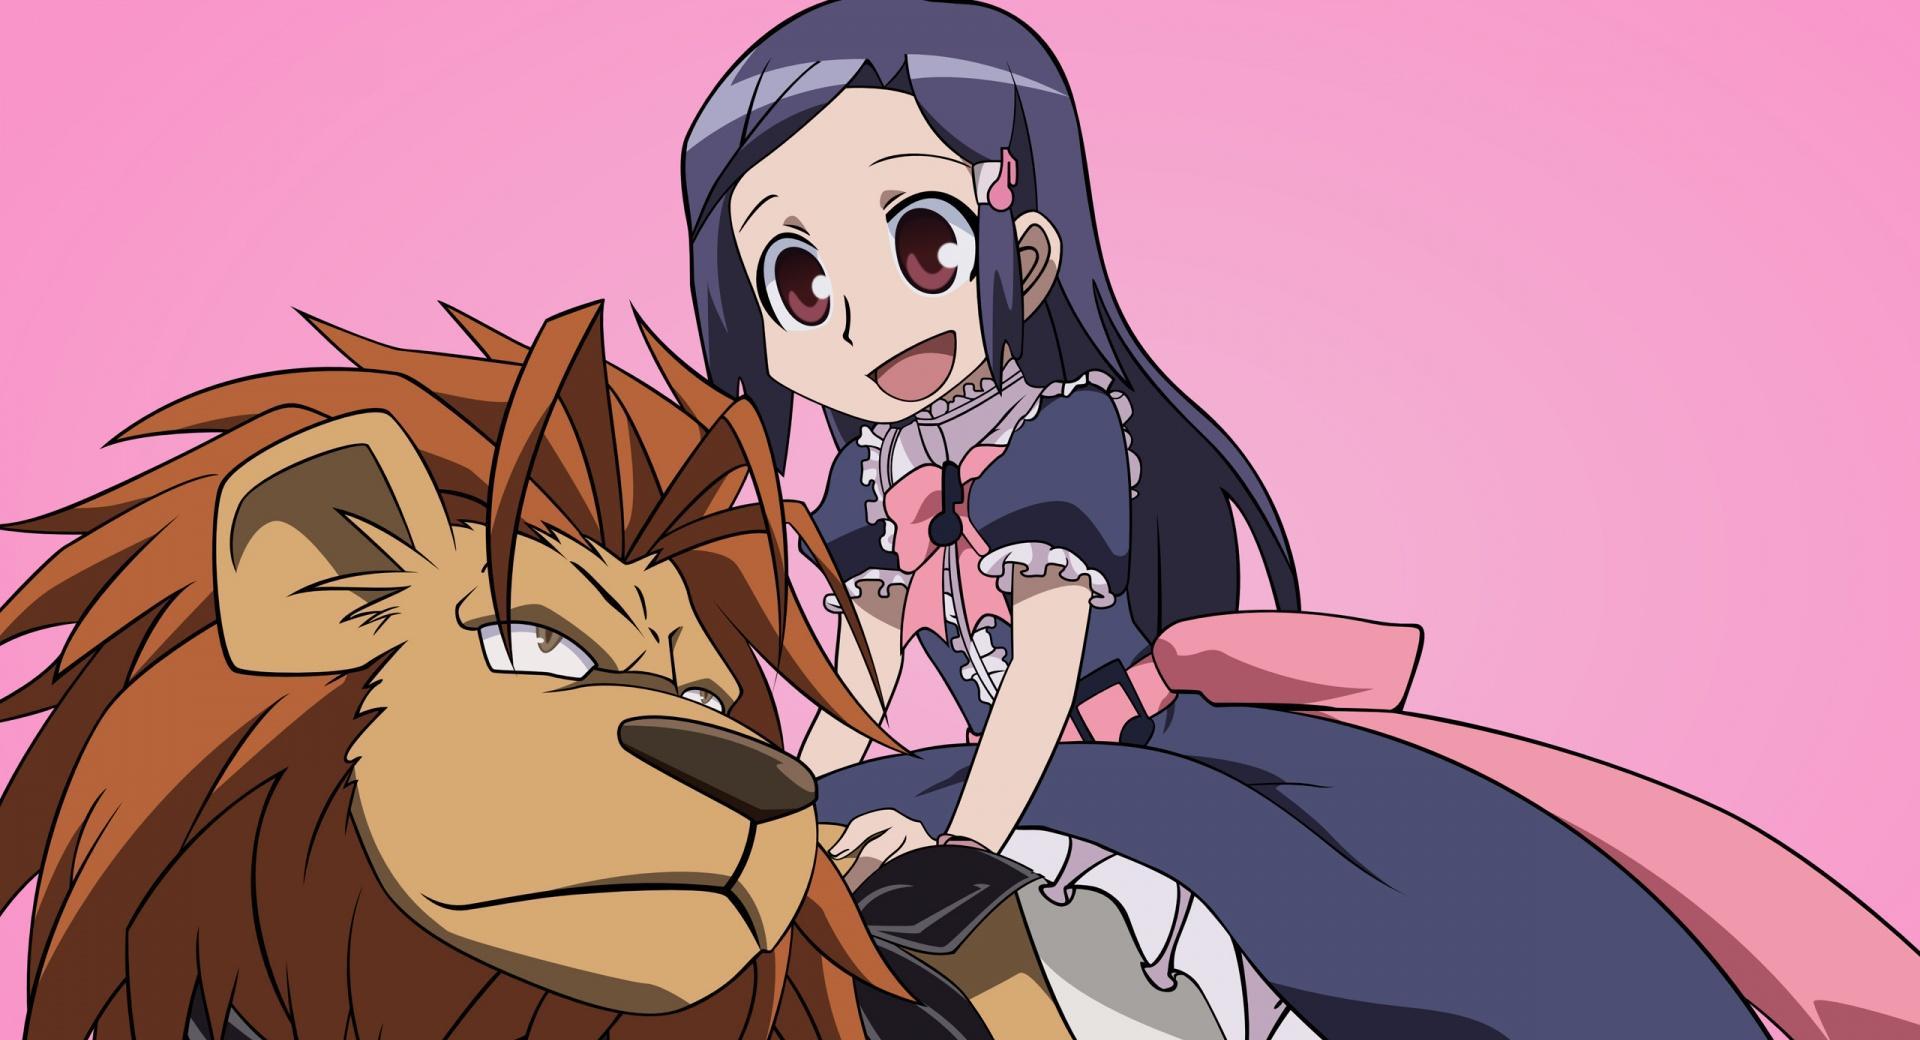 Kyouran Kazoku Nikki Manga wallpapers HD quality